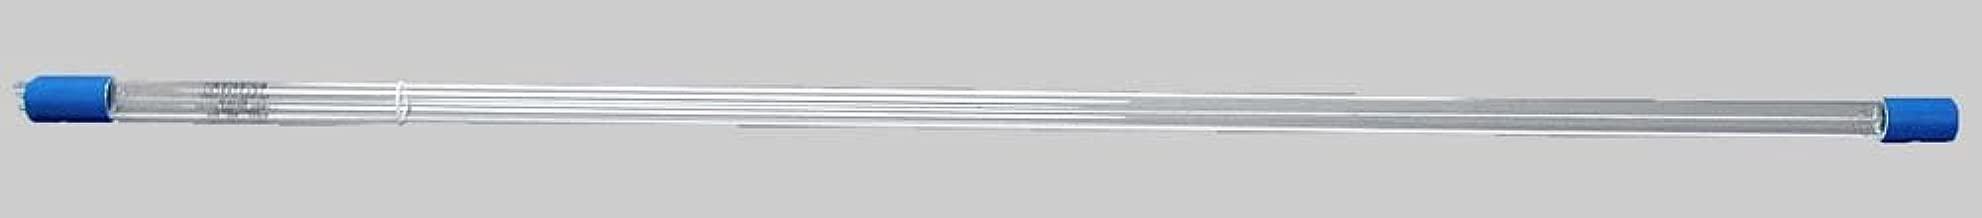 40 Watt Aqua UV Replacement Lamp for UV Sterilizer